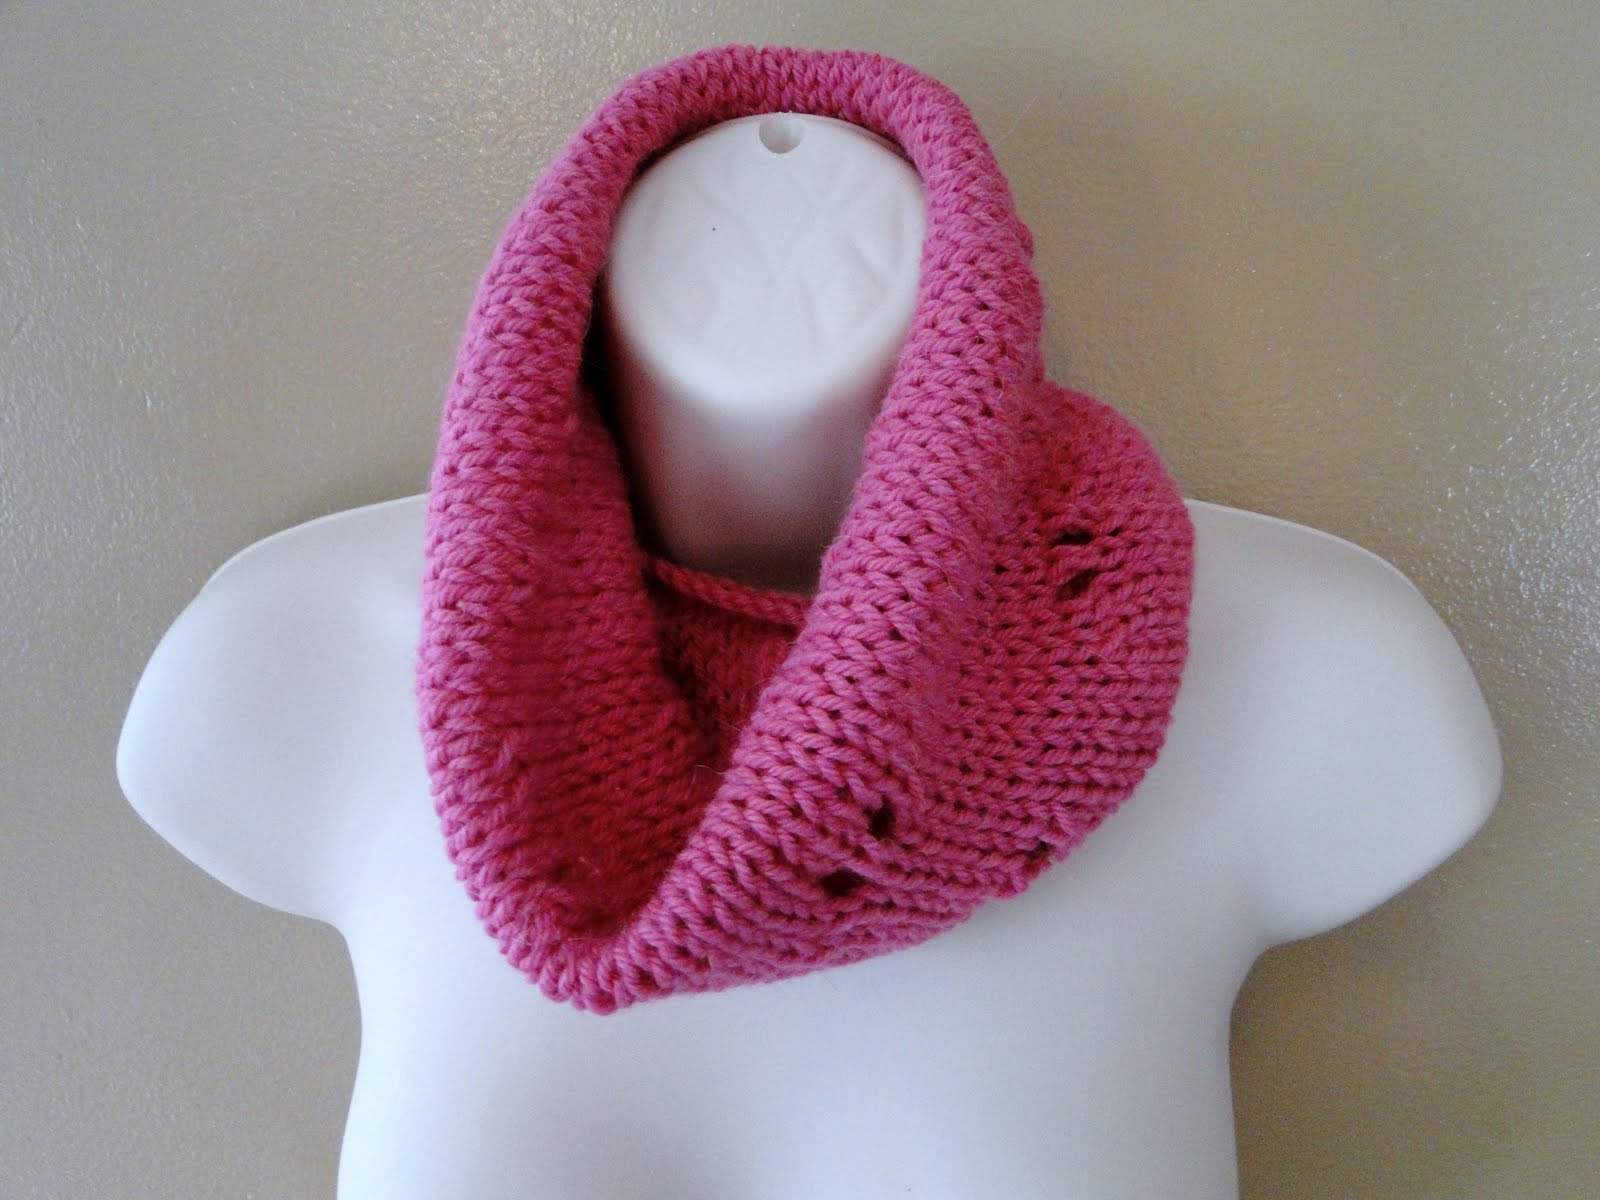 Free Knitting Pattern For Eyelet Cowl : Ruby Knits: Free Pattern Friday - Eyelet Cowl